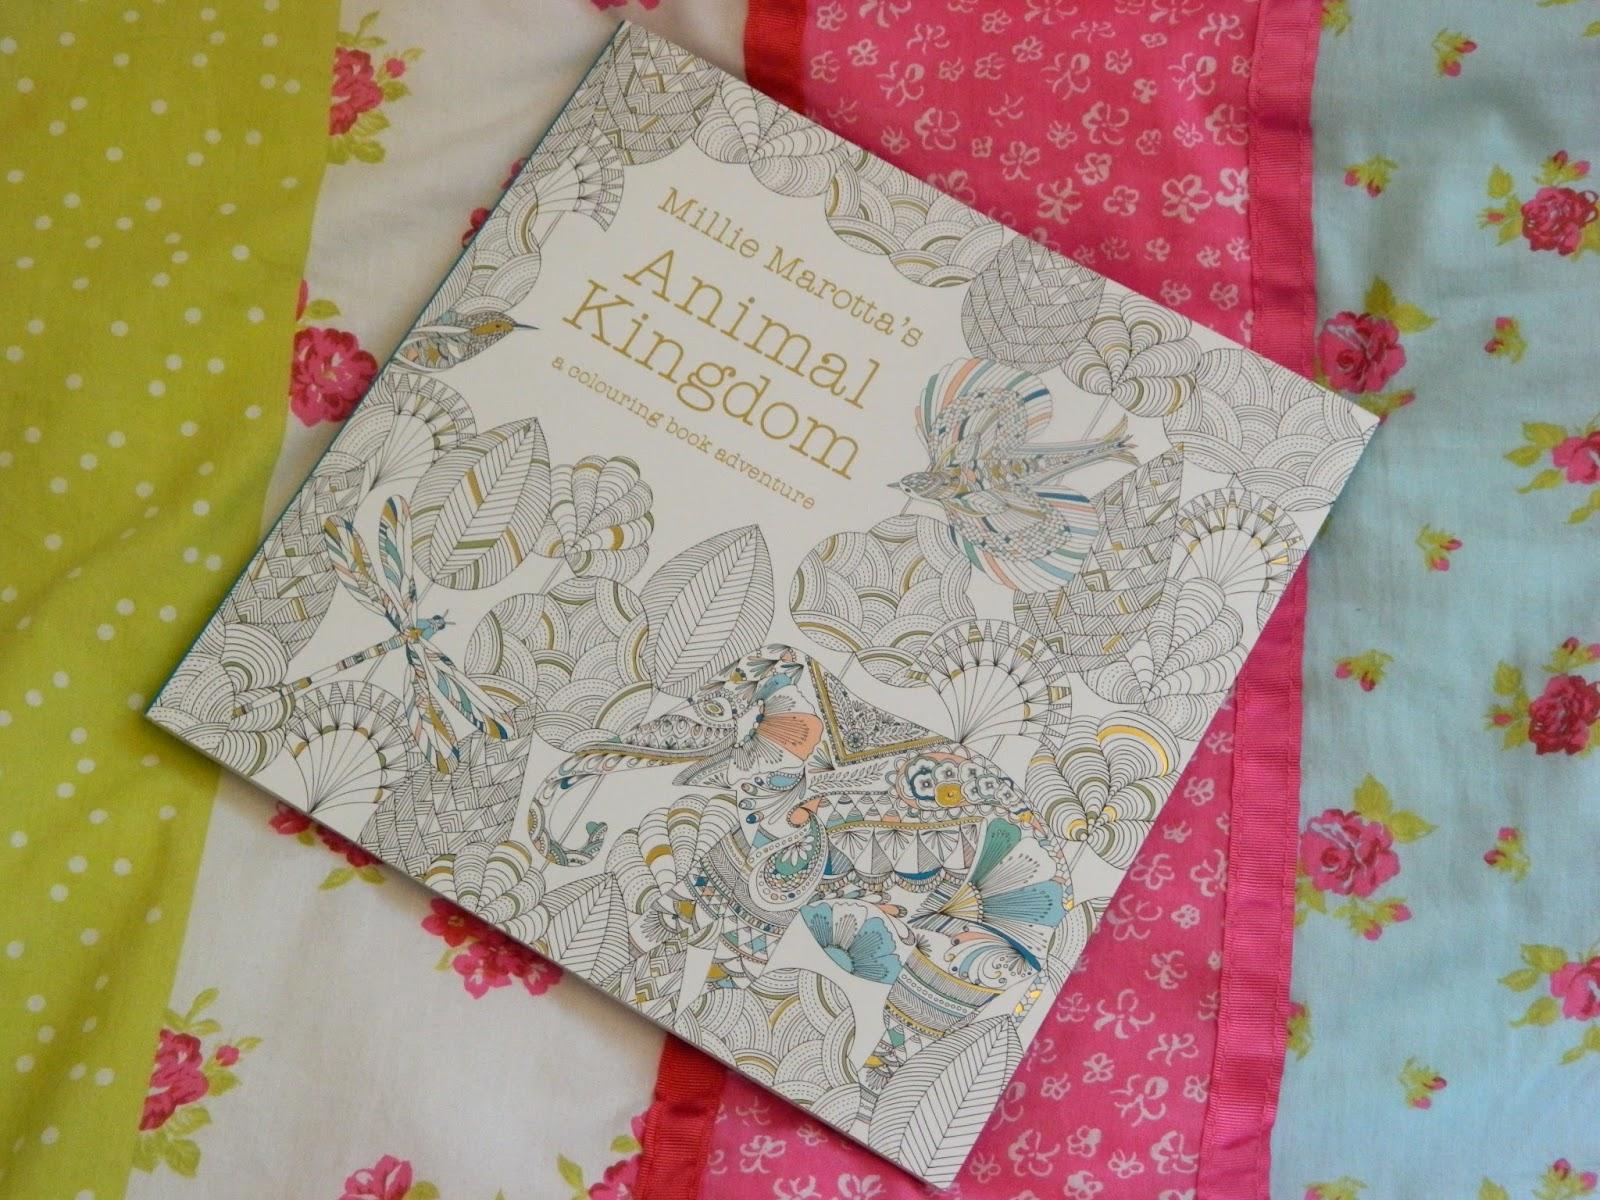 Animal Kingdom By Millie Marotta Adult Colouring Books